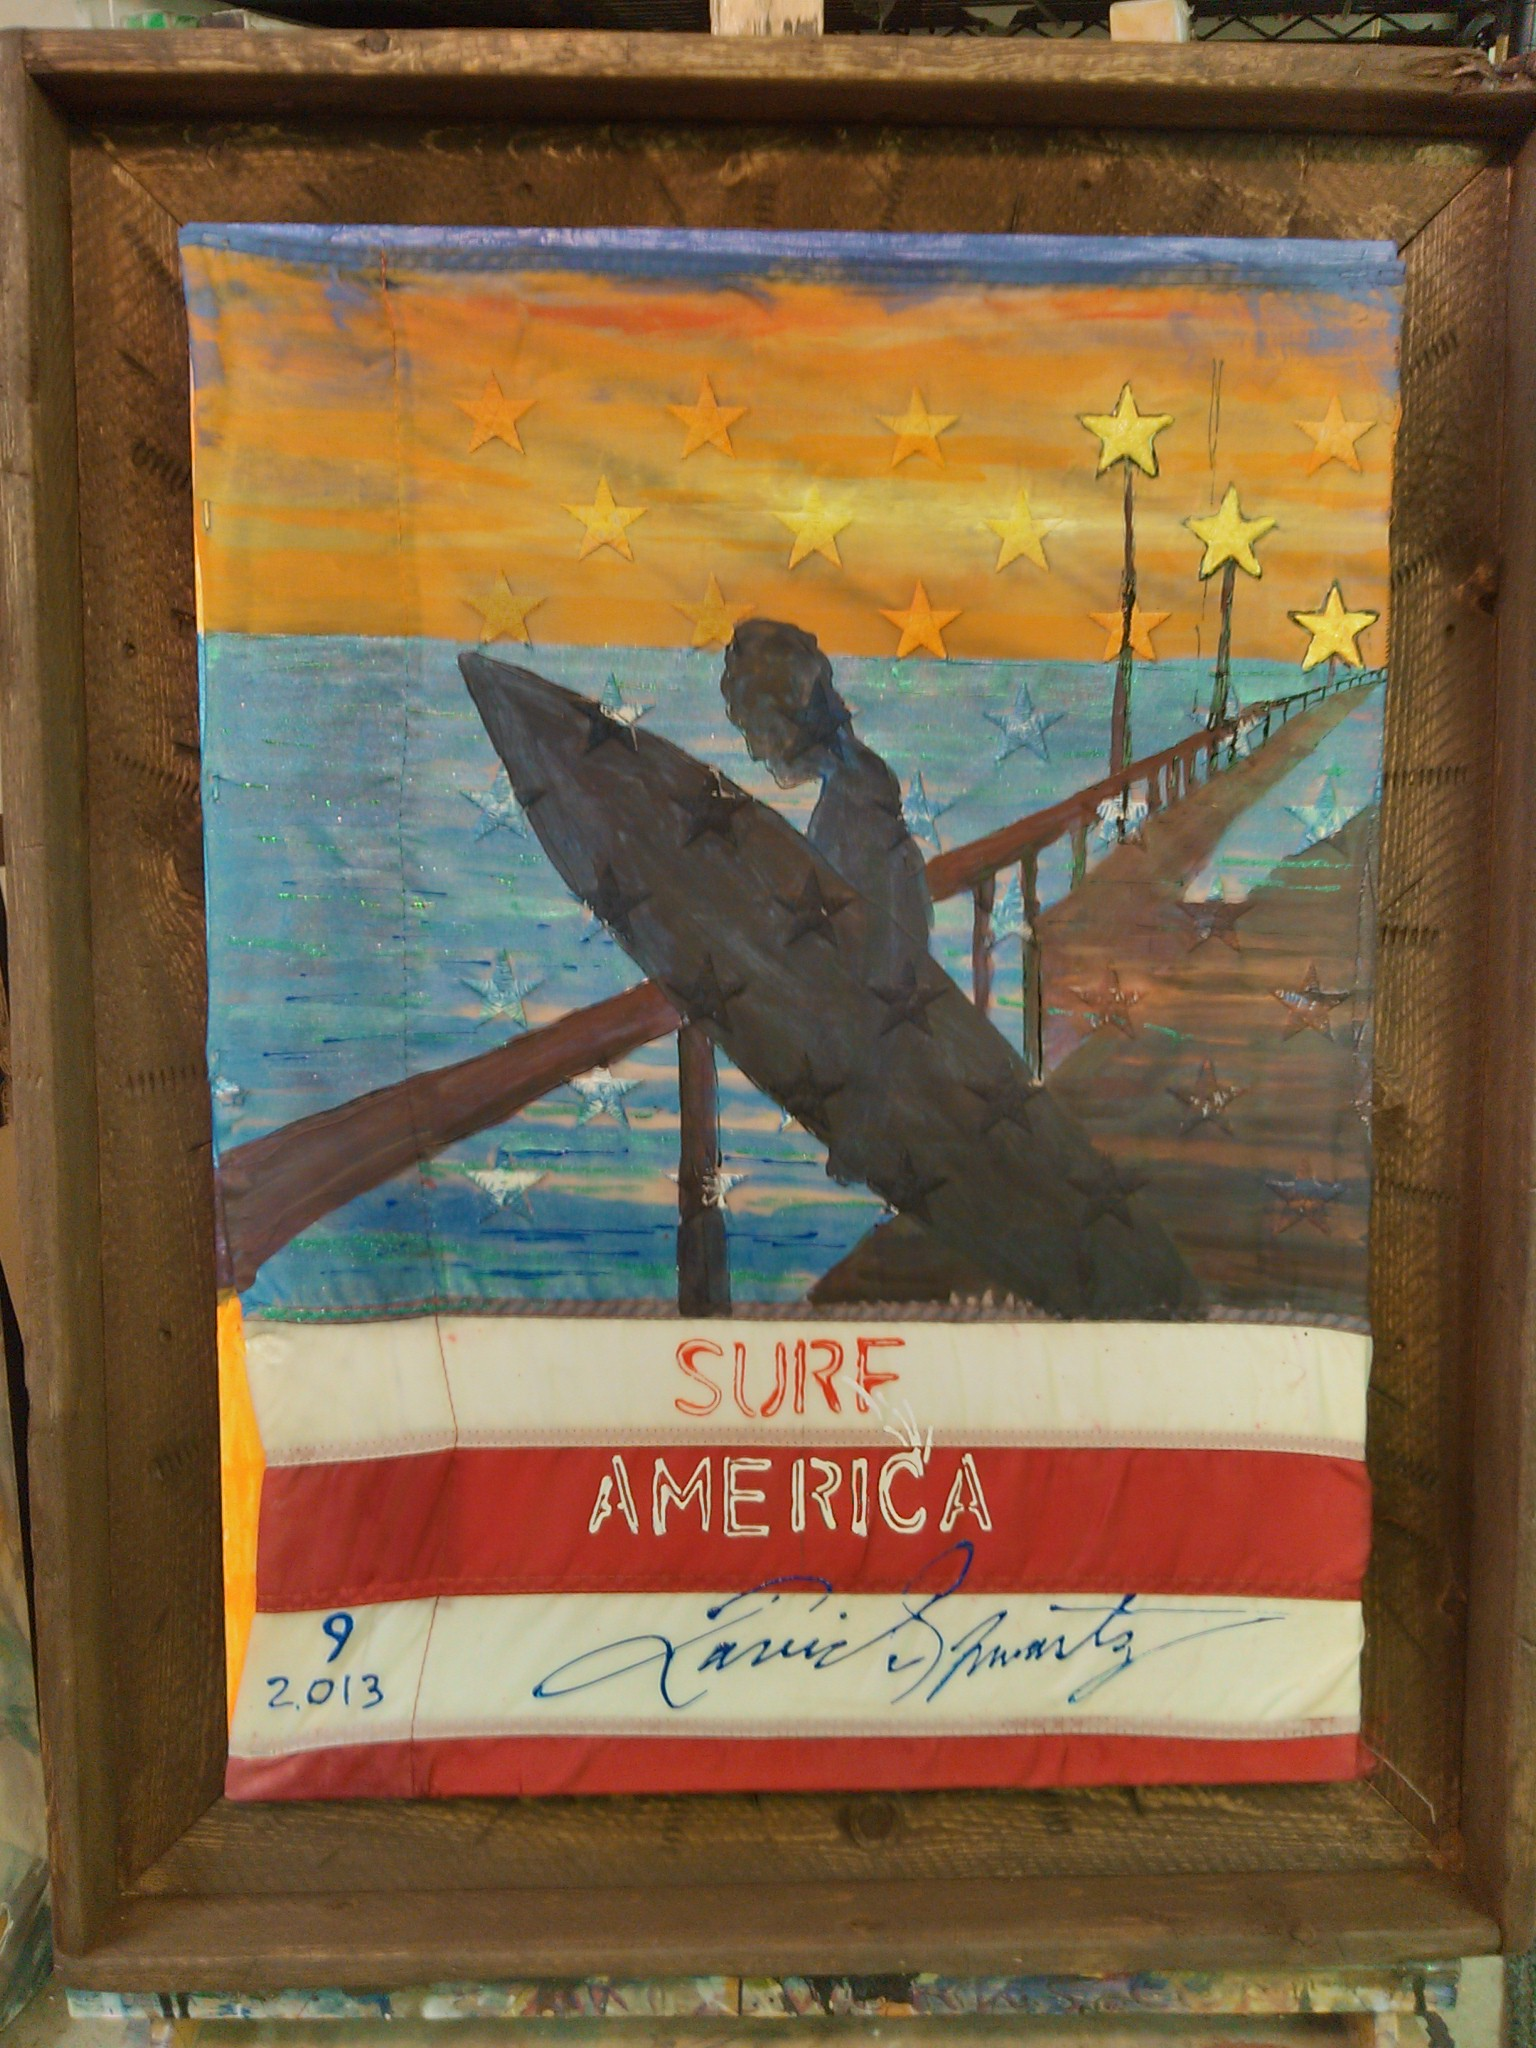 Surf America 2013